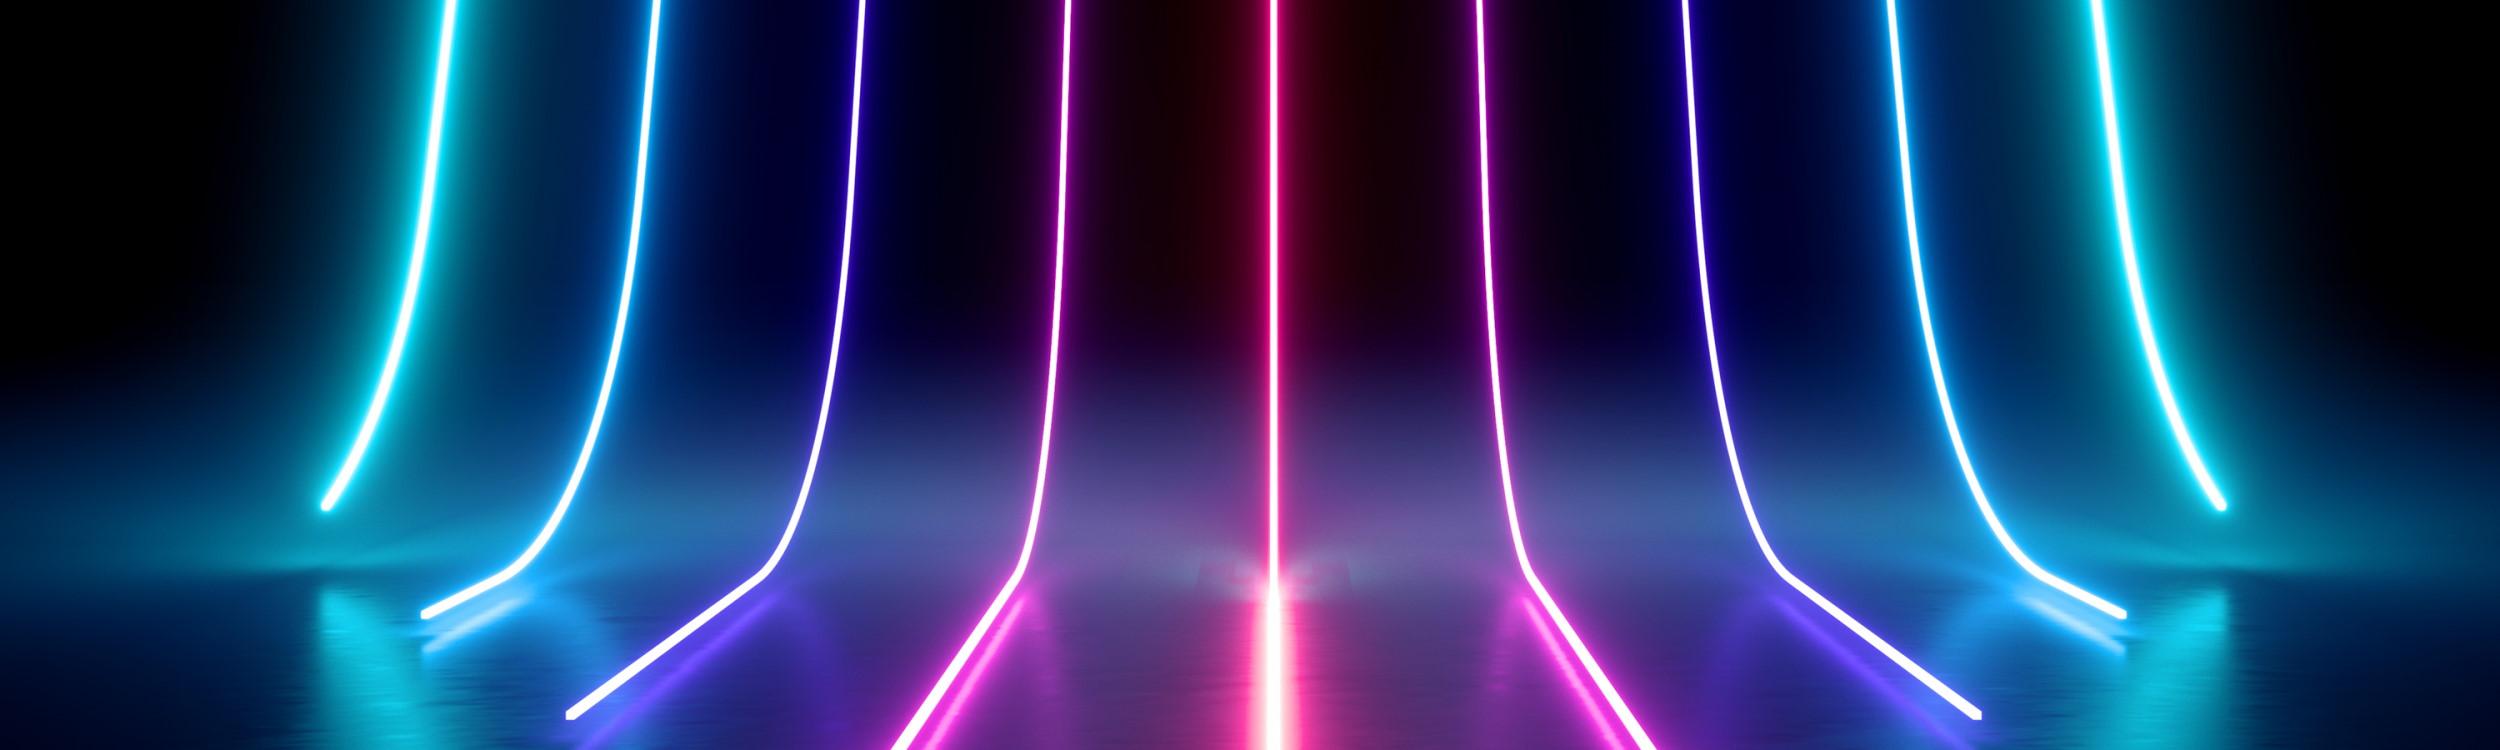 neon-nagel_header_leitsysteme